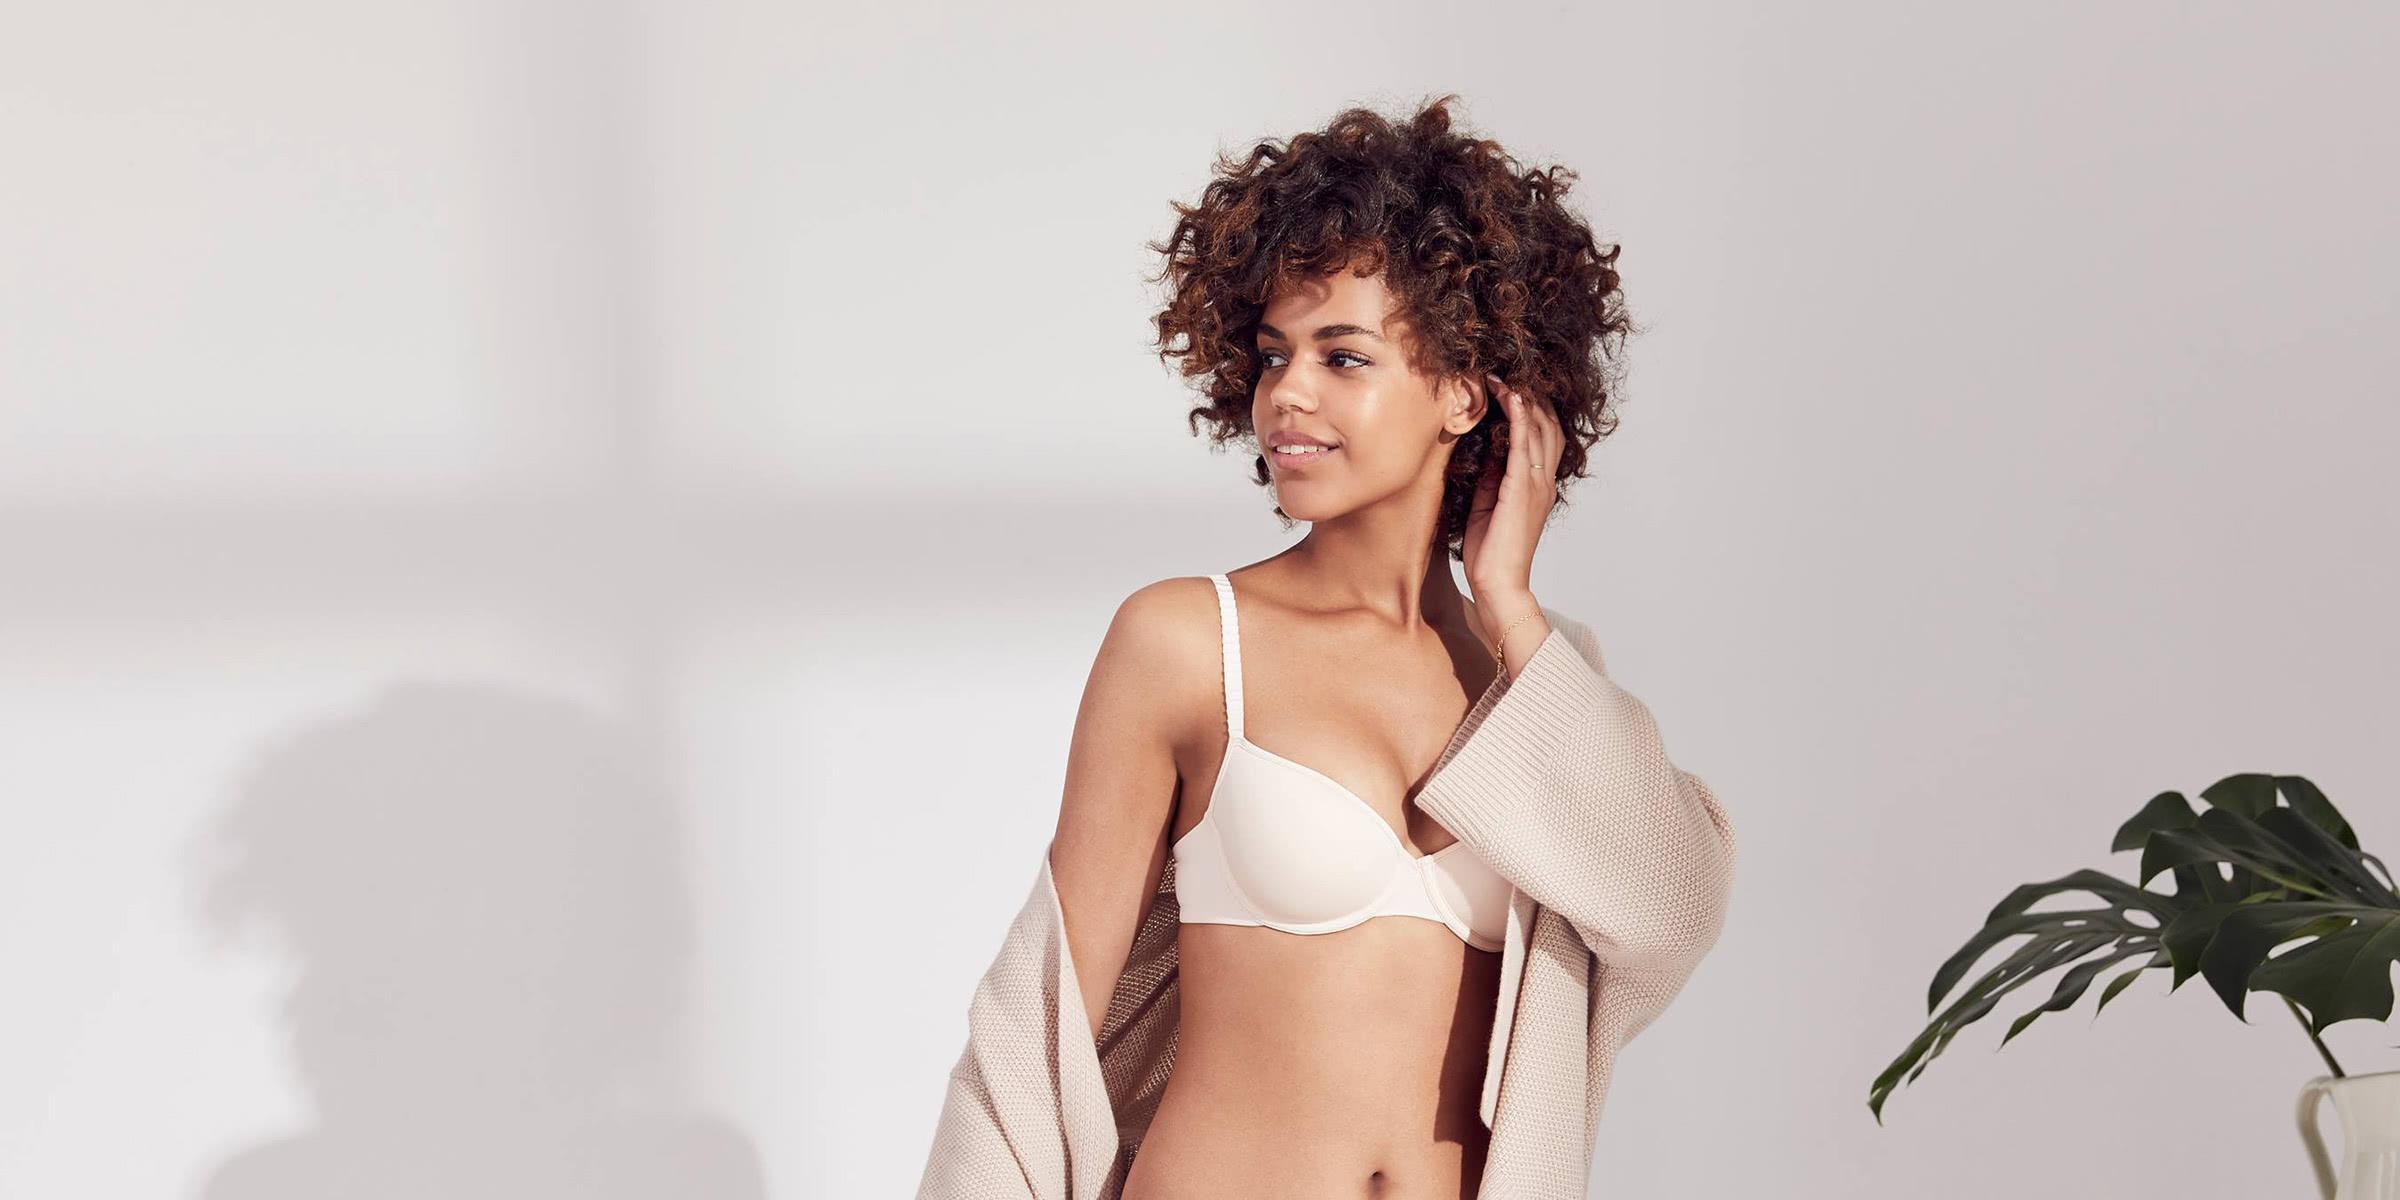 best lingerie brands - Luxe Digital